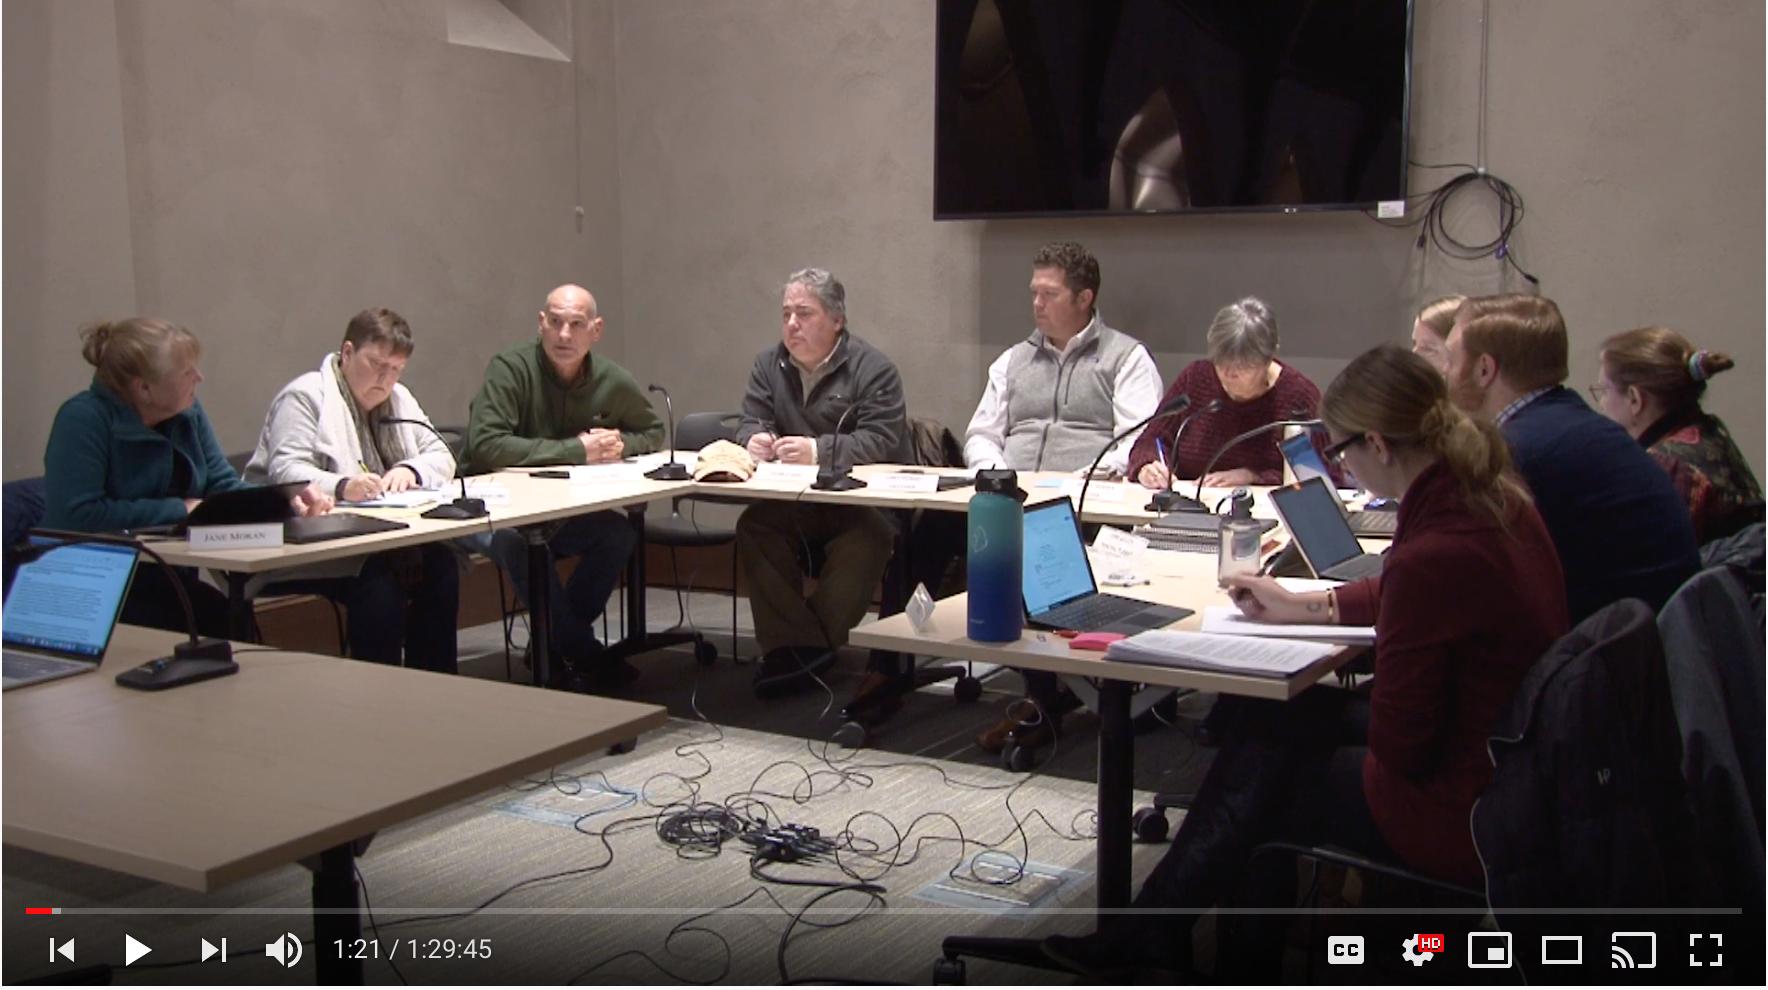 Planning Board Actions Taken 12/16/19